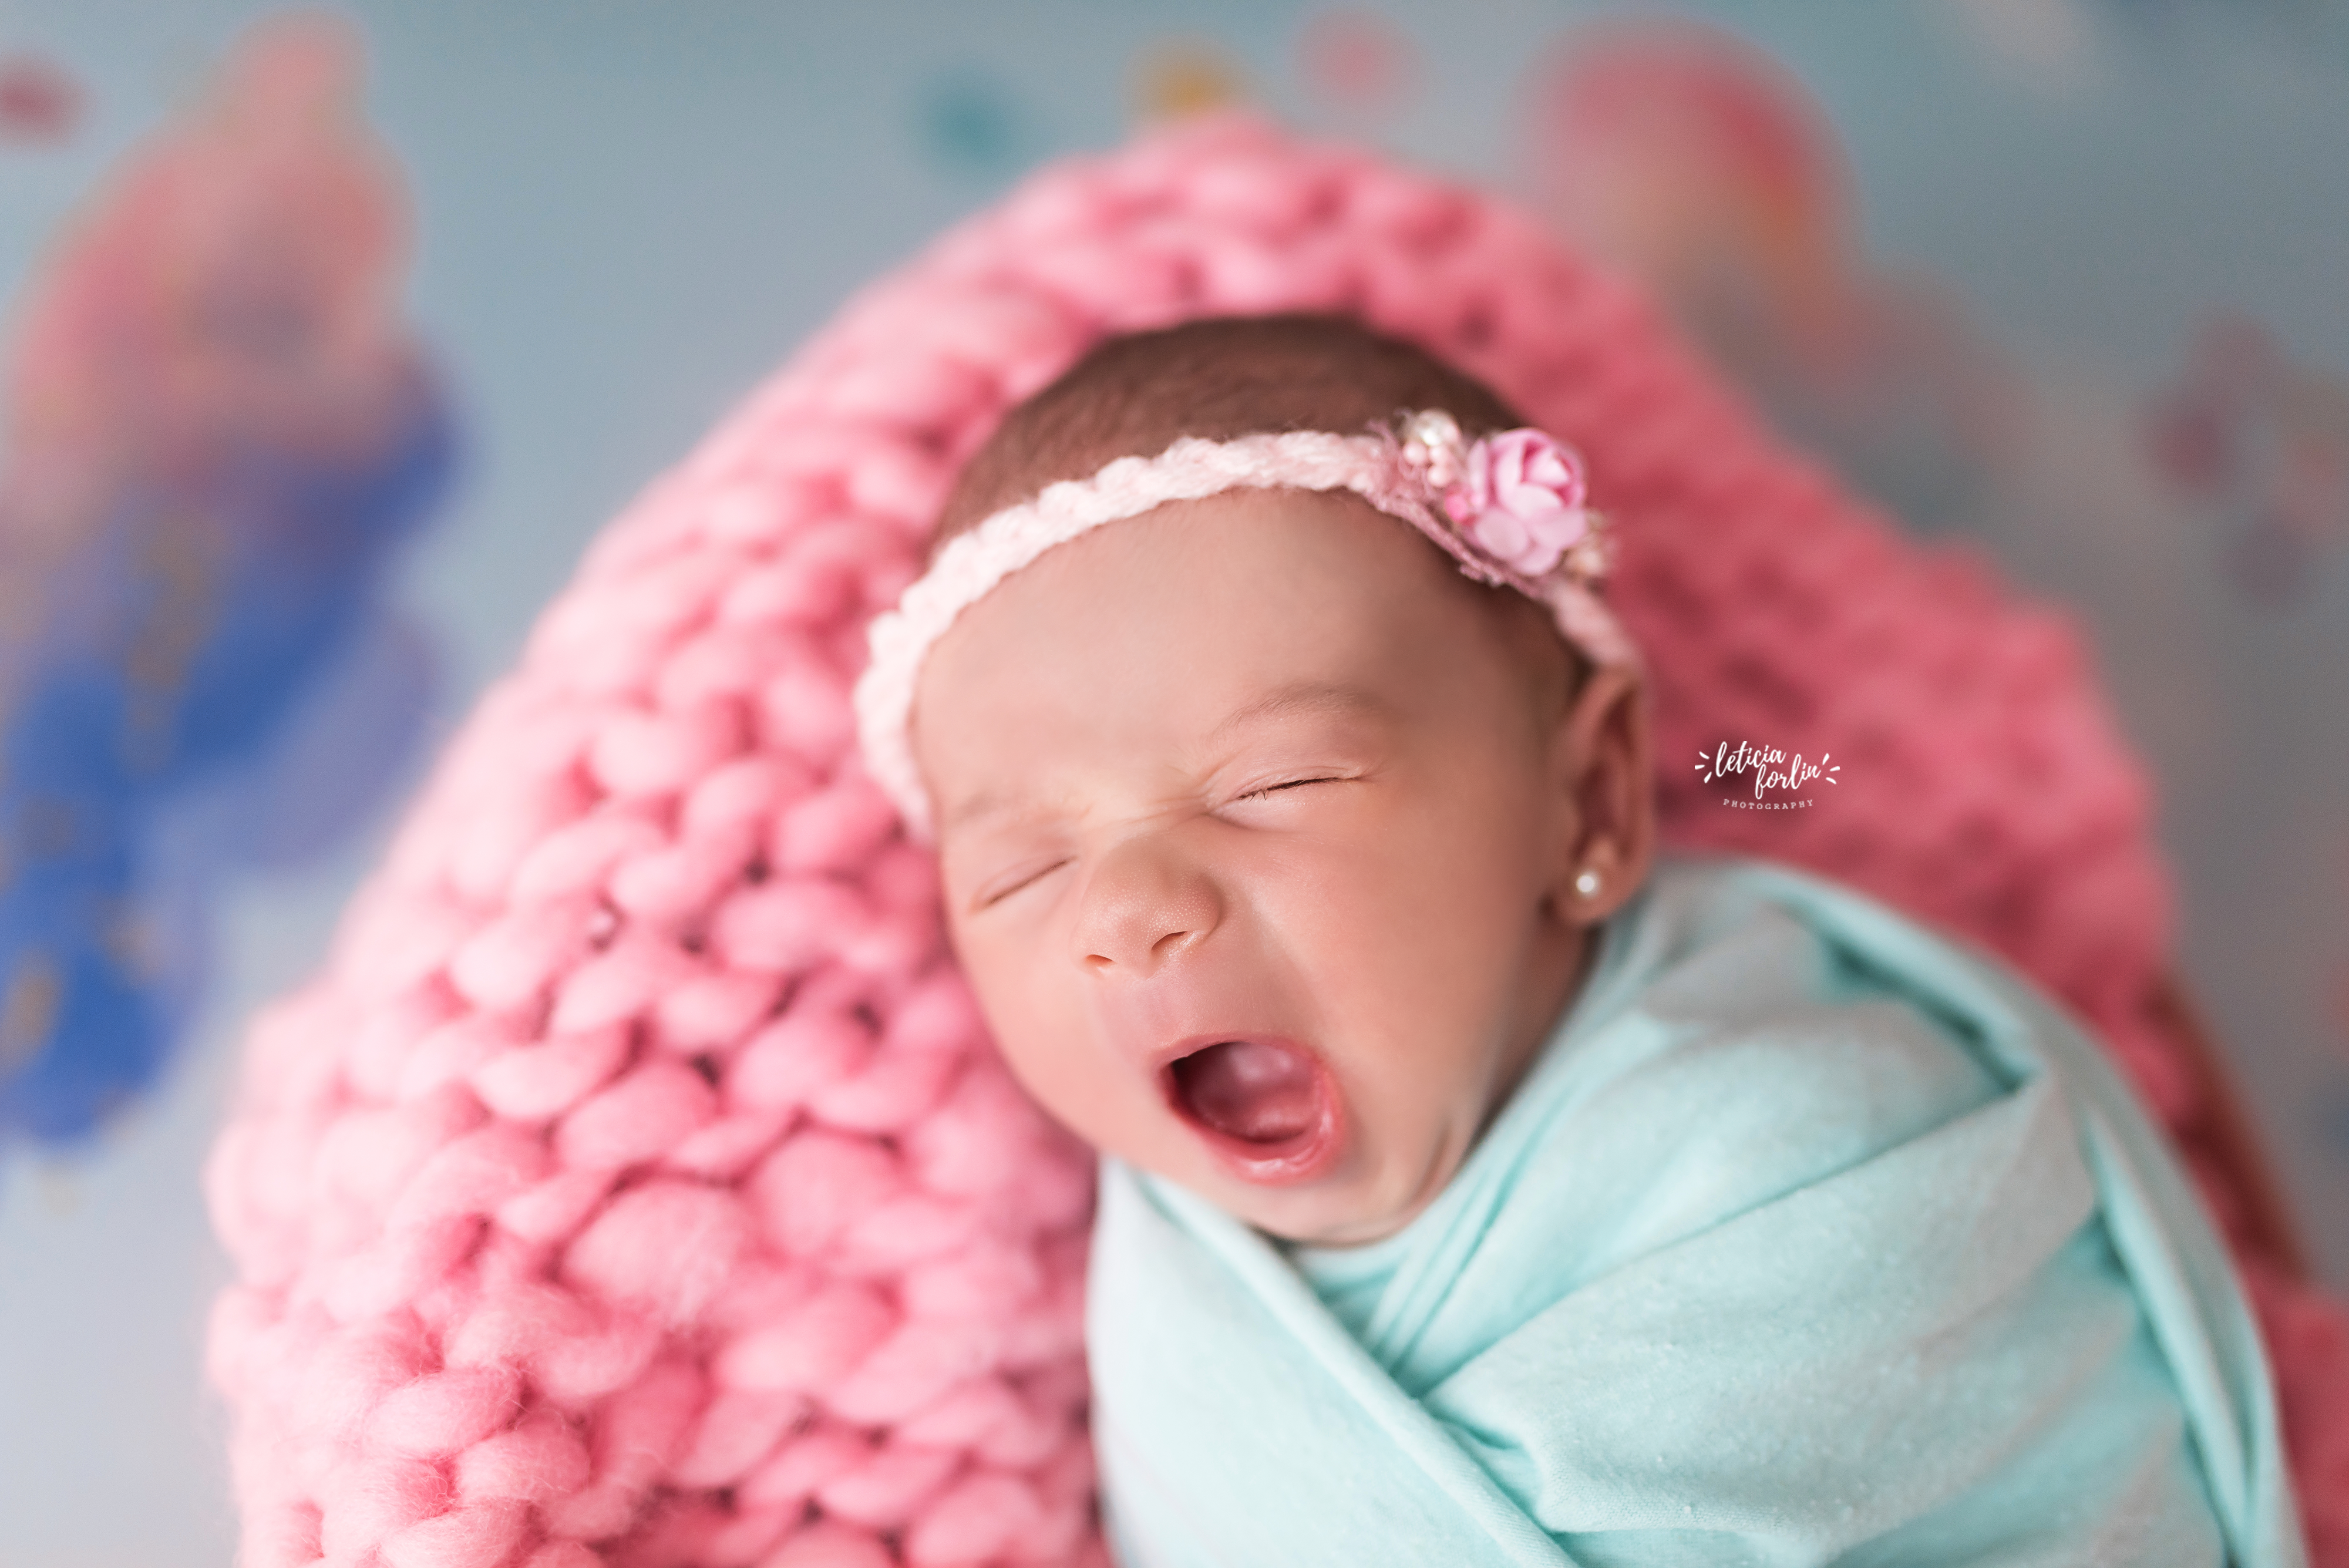 Contate Studio Leticia Forlin - Fotografia Newborn, Infantil e Família